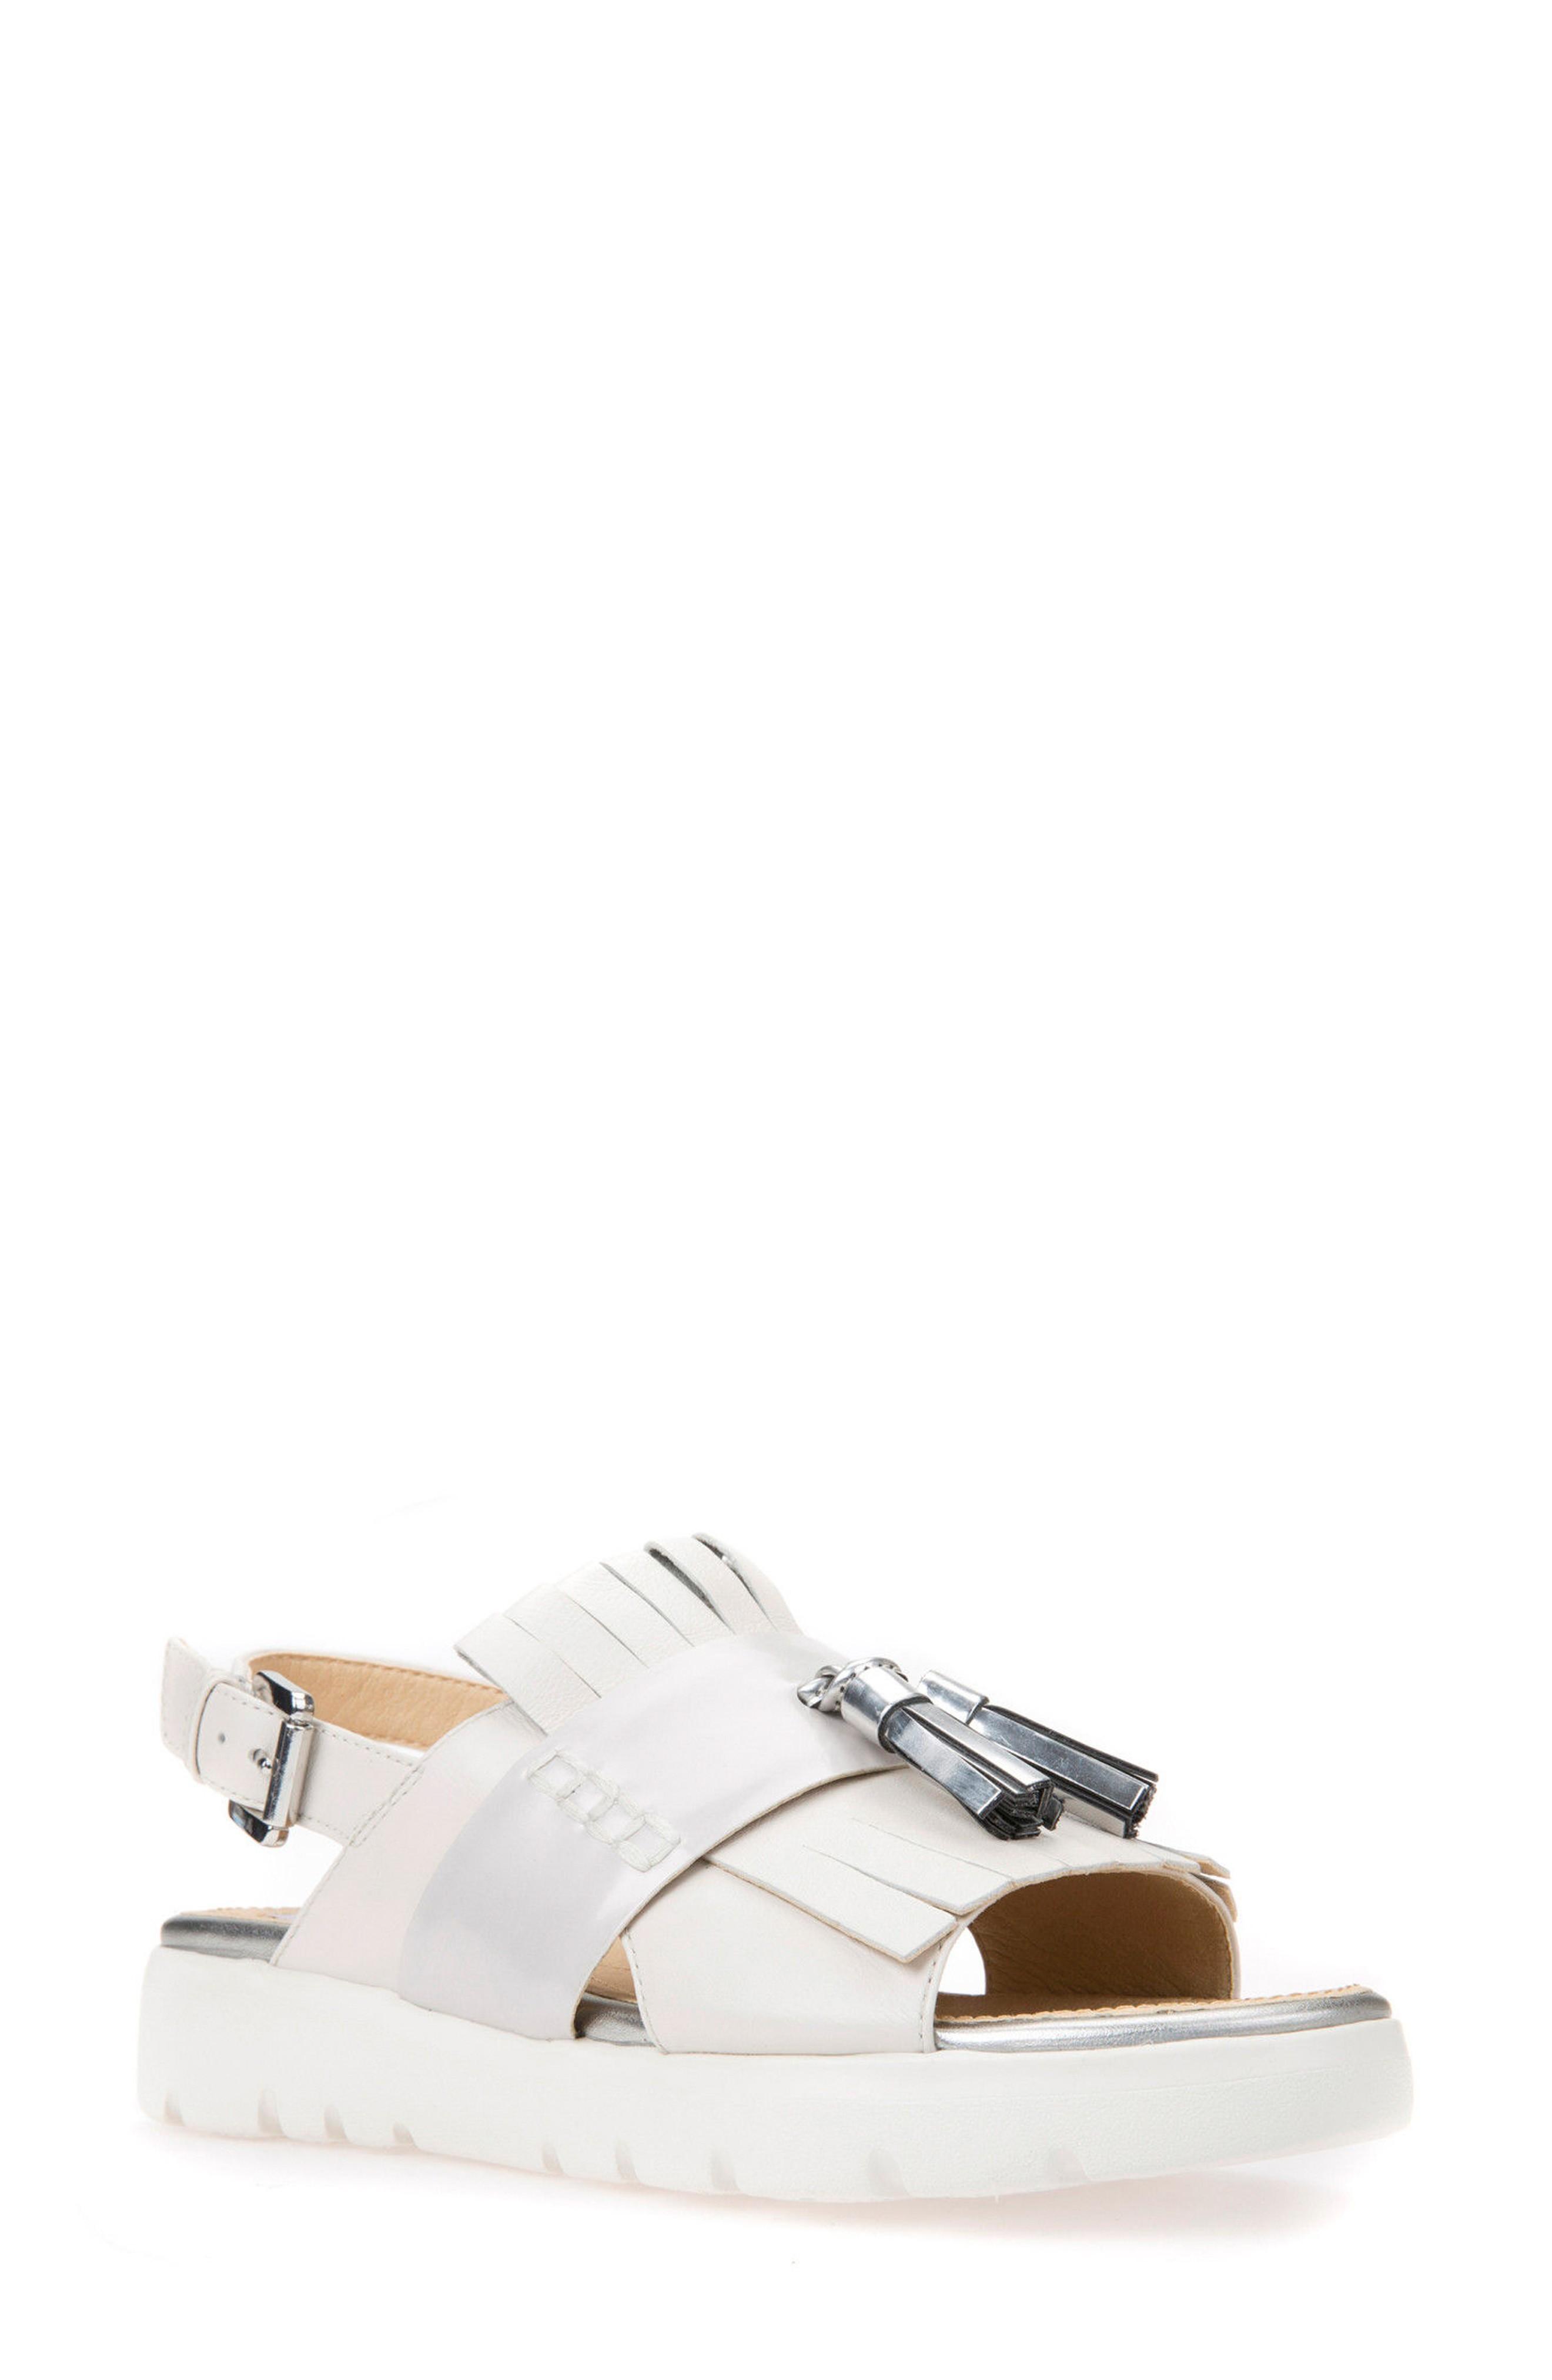 e51812ca402 Geox Amalitha Platform Sandal In Off White Leather